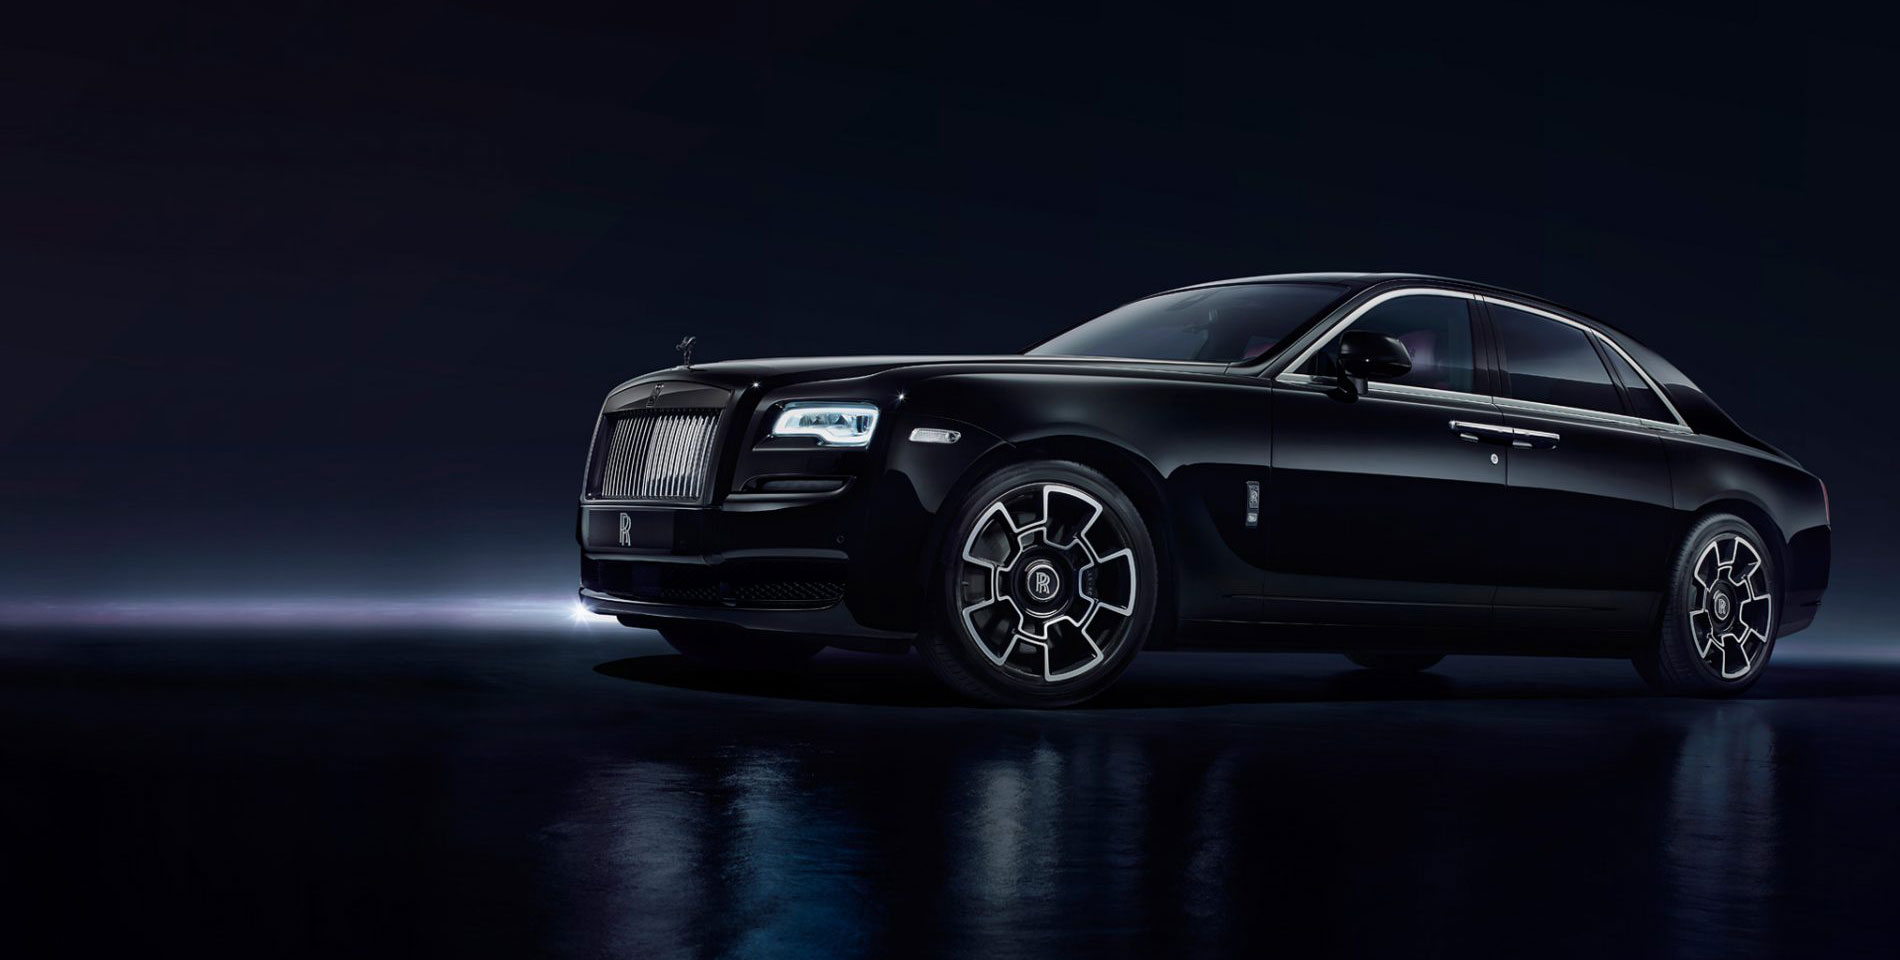 Rolls Royce Ghost Black Badge Miller Motorcars New Rolls Royce Dealership In Greenwich Ct